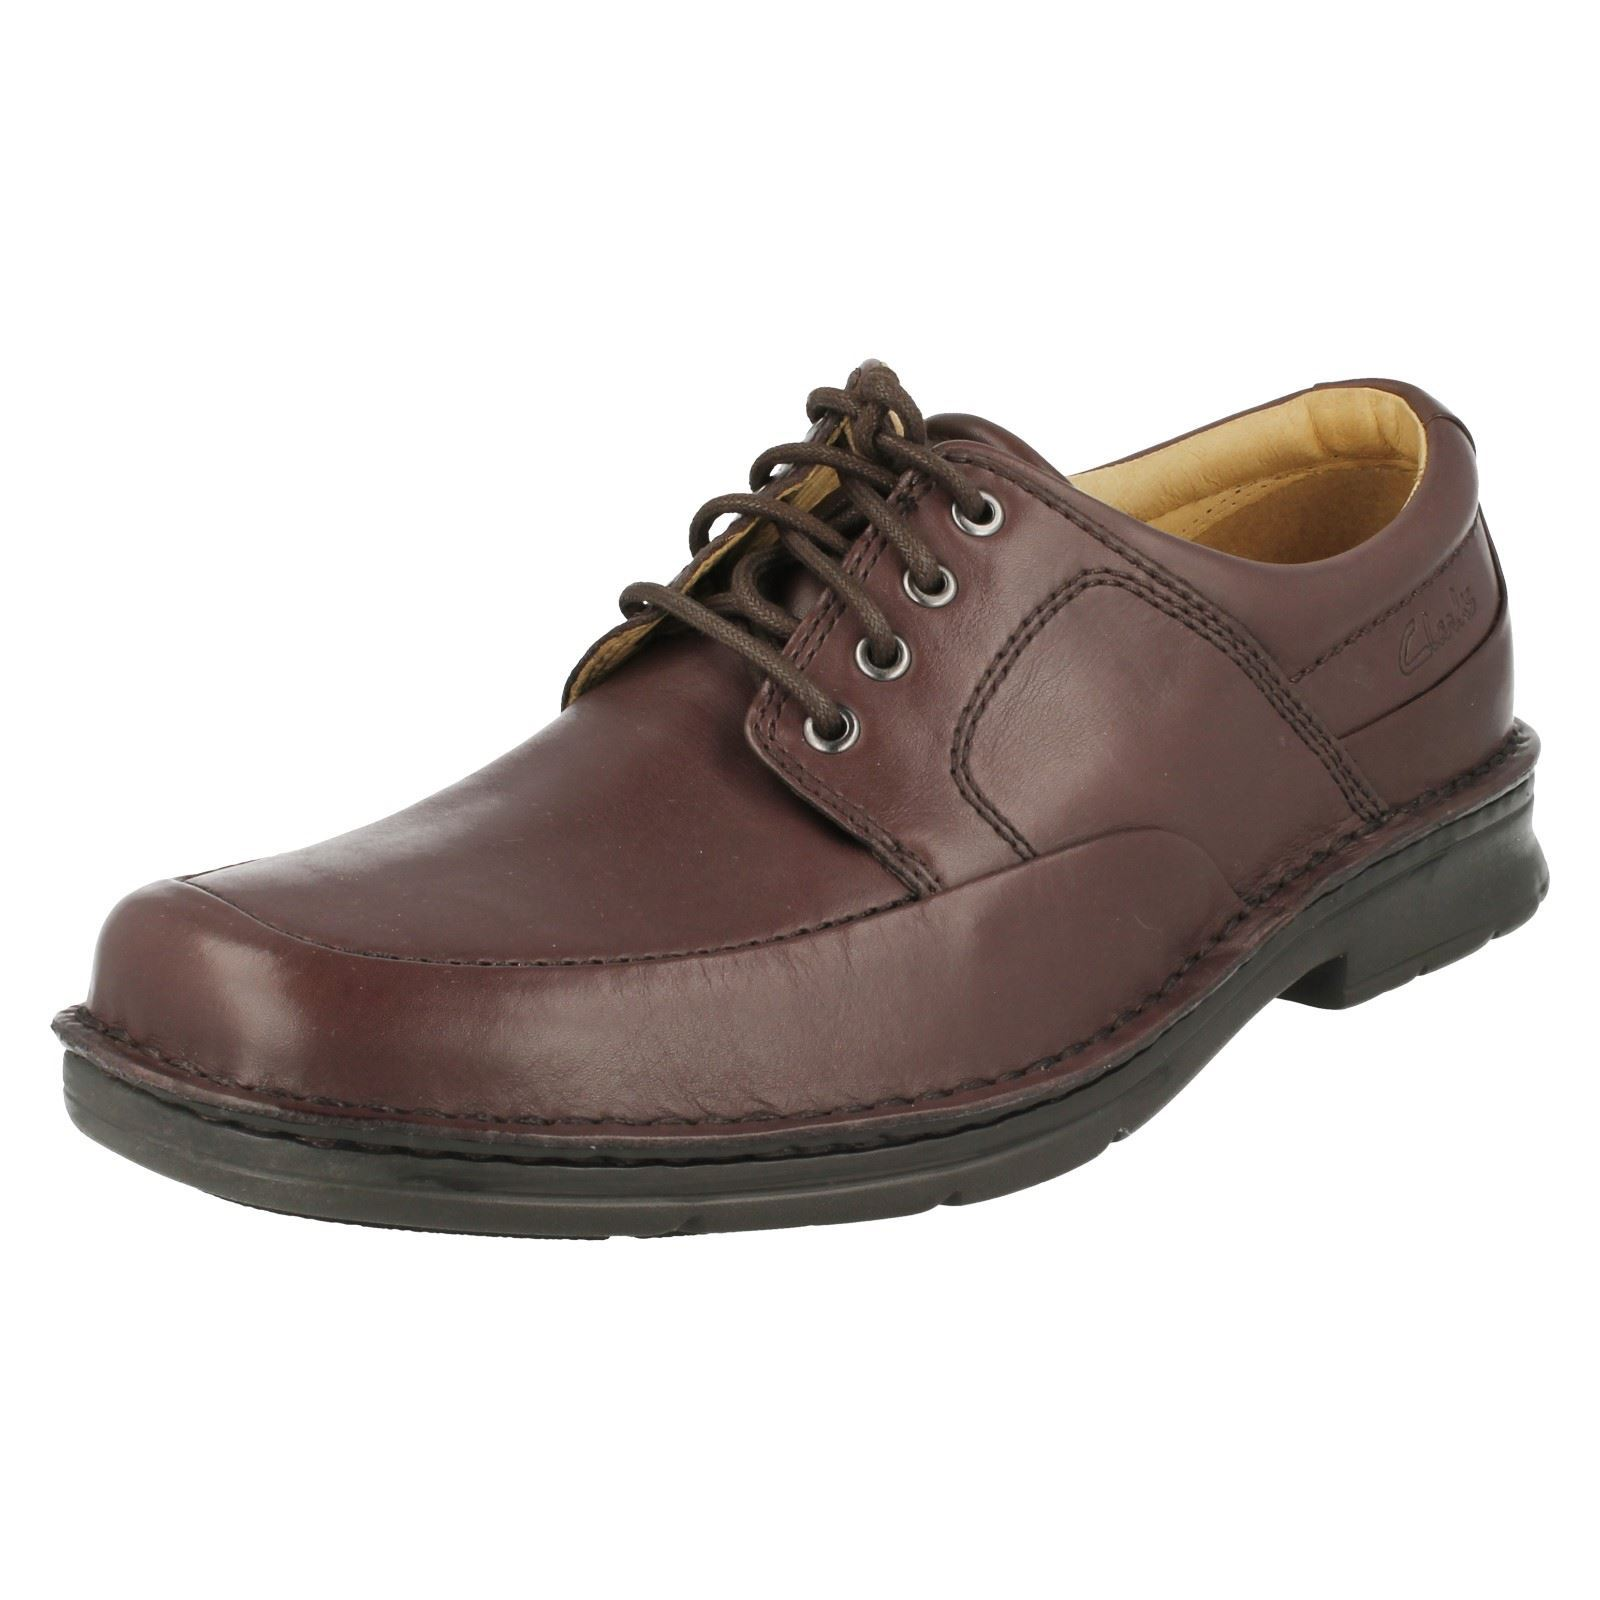 Clarks marrón hombre Zapatos cordones para Salute con Run Ebony 84IqOIdxw